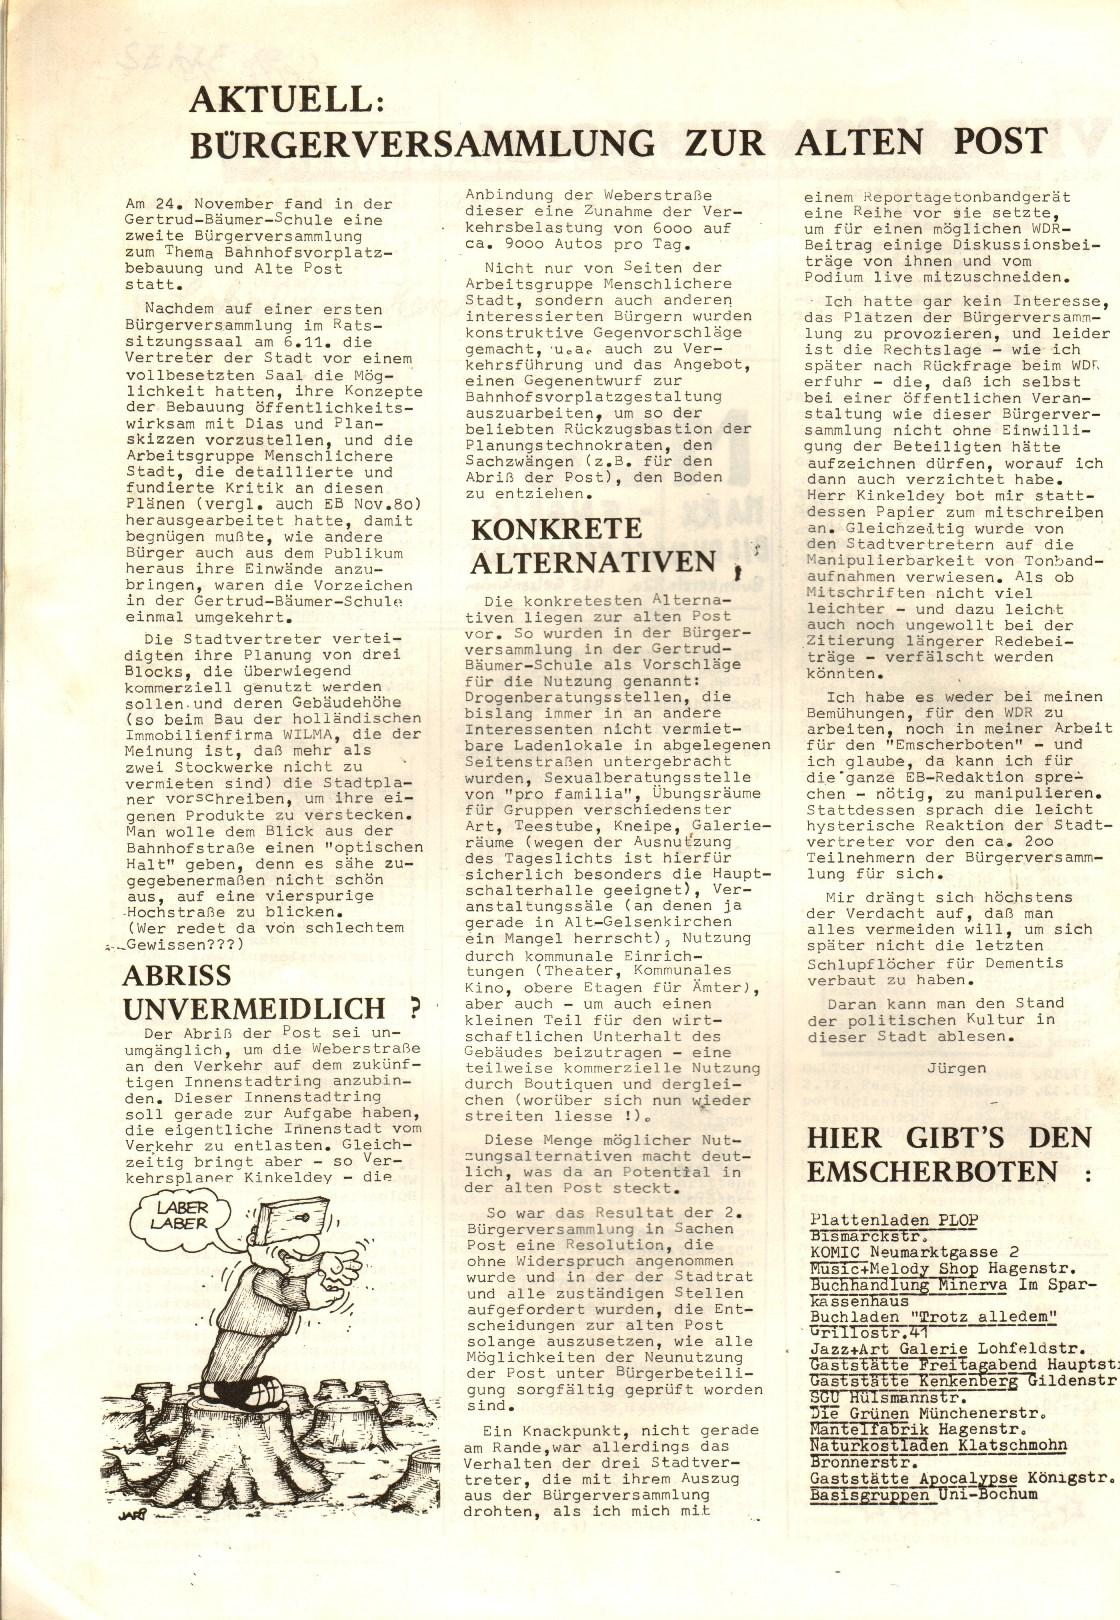 Gelsenkirchen_Emscherbote_1980_03_20